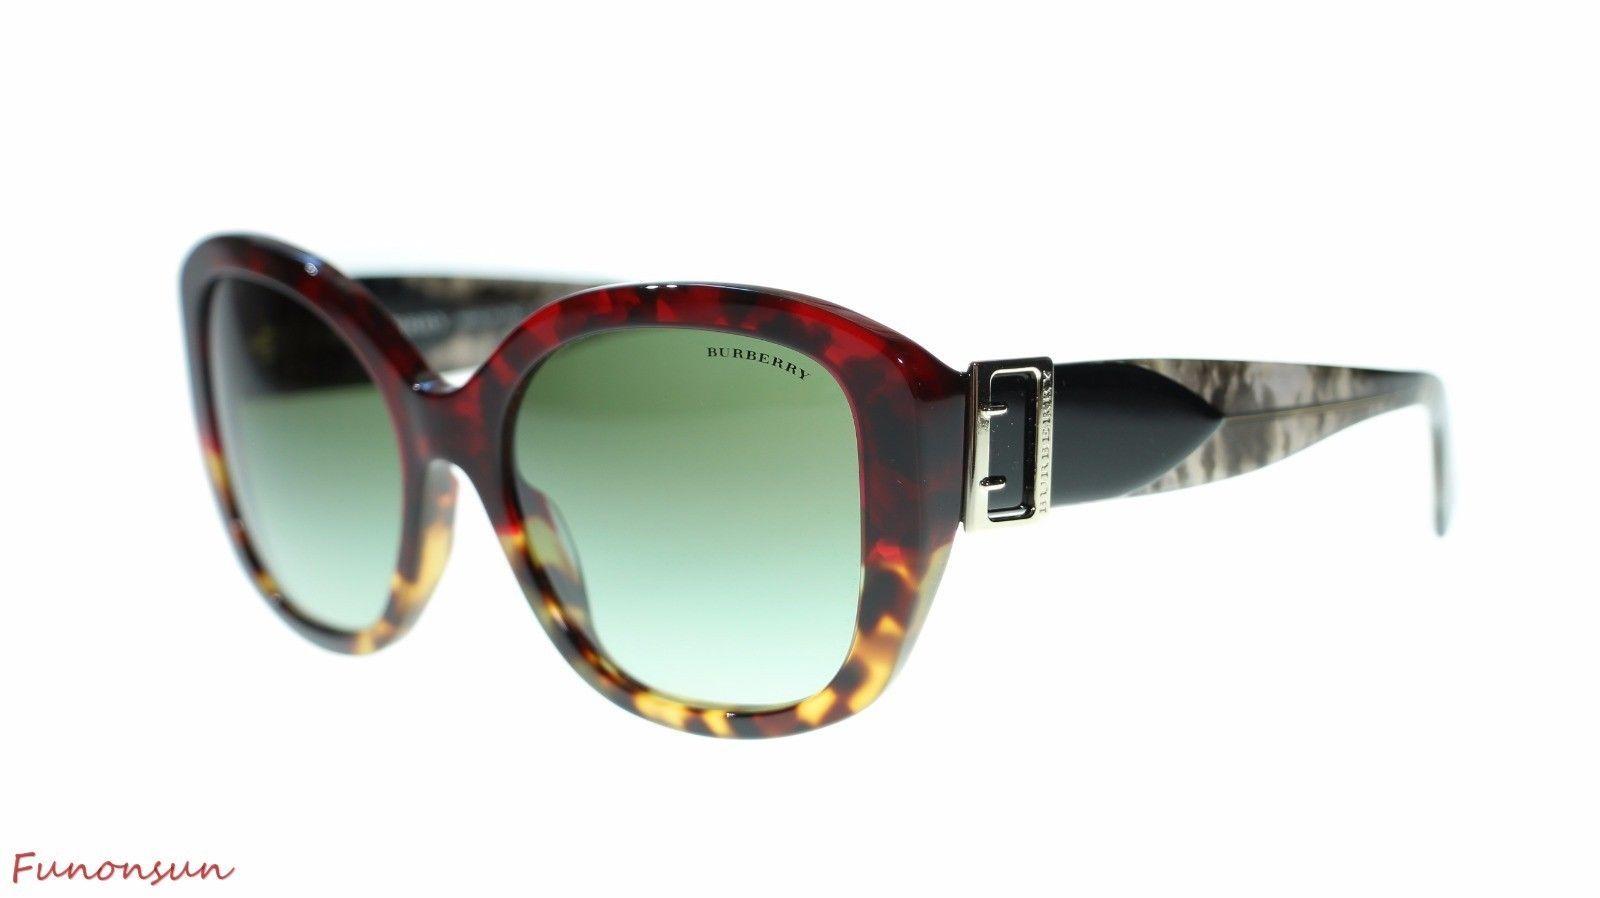 4c16e2d7fb32 S l1600. S l1600. Previous. Burberry Women Sunglasses BE4248 36358E Red  Havana/Green Gradient Lens 57mm